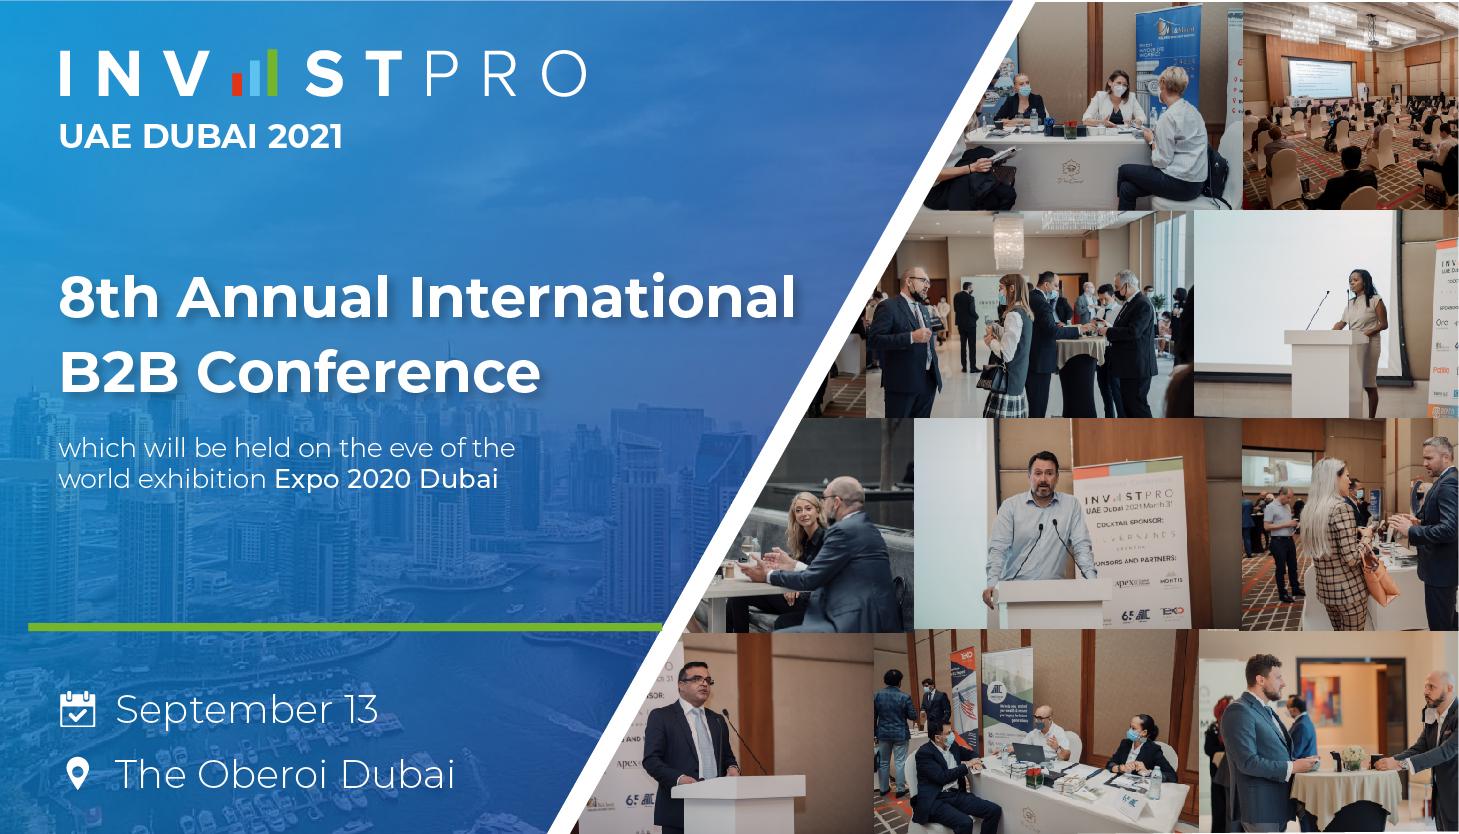 You're Invited to InvestPro UAE Dubai 2021